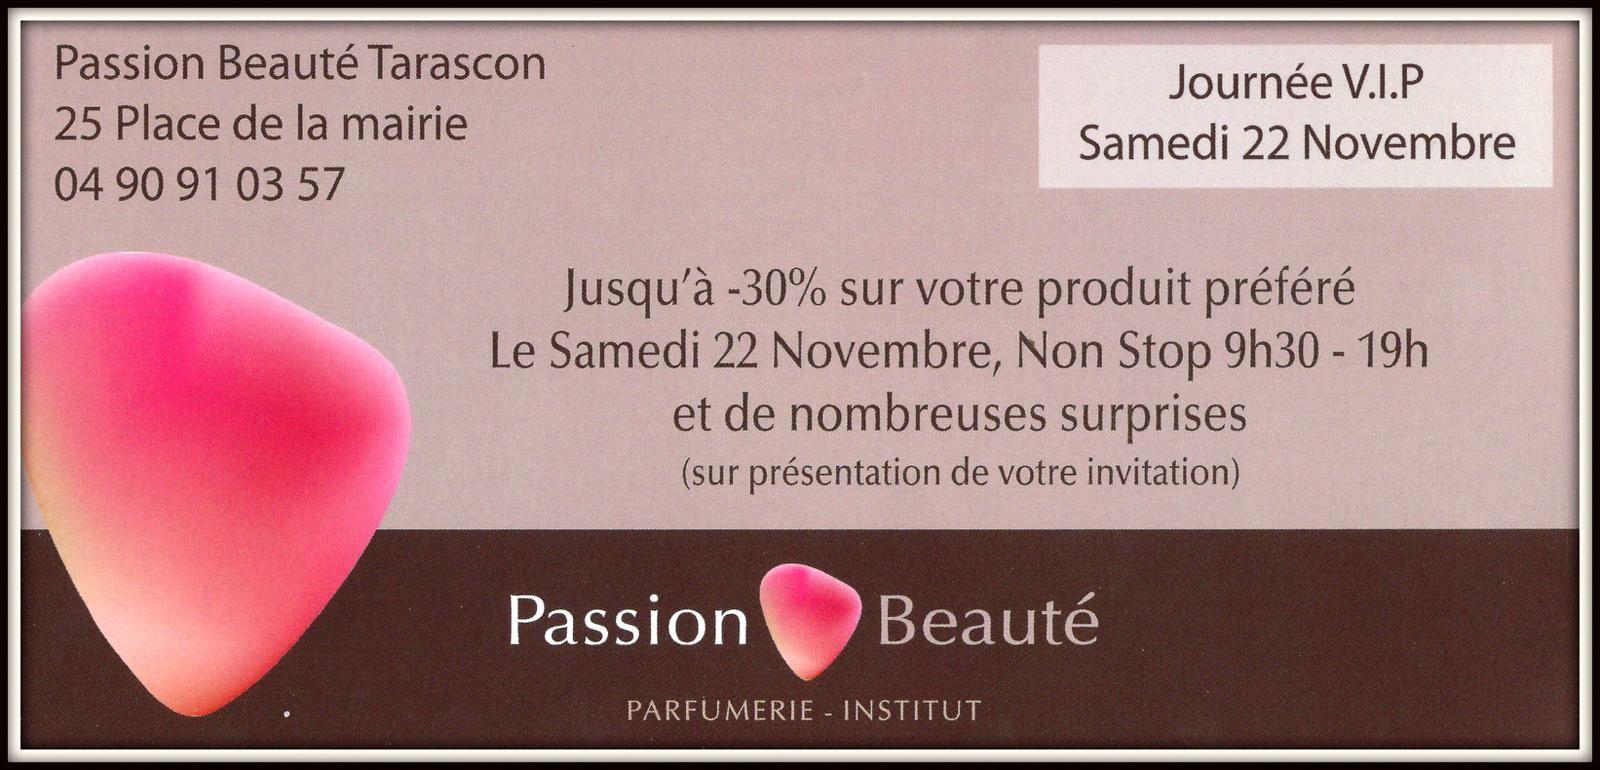 RDV samedi 22 novembre chez passion Beauté à Tarascon !